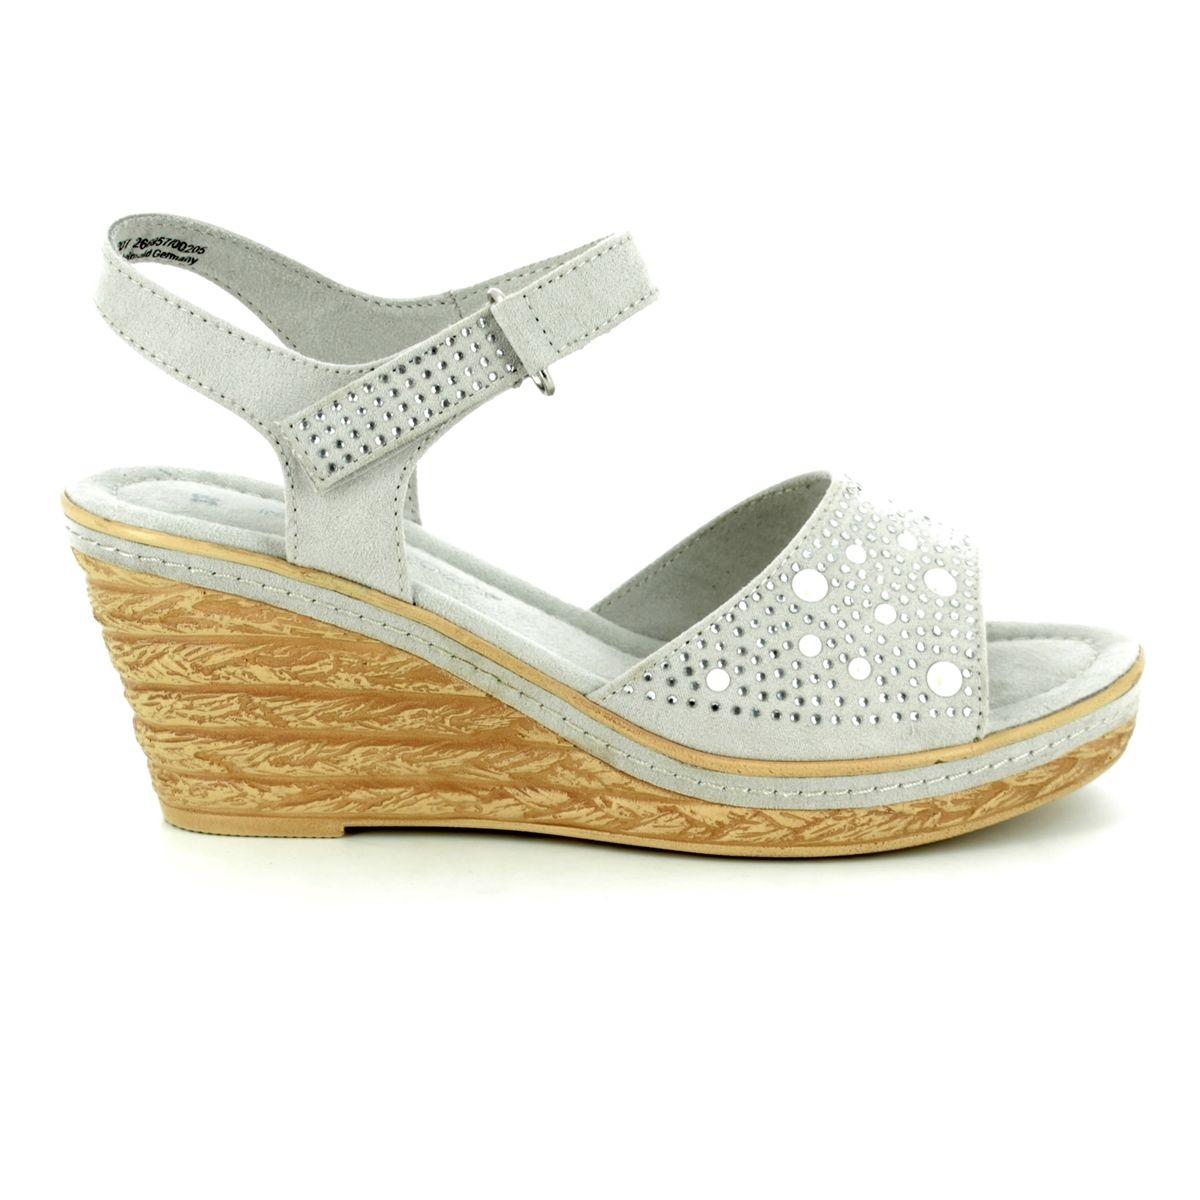 12ec4ce9a7cb Marco Tozzi Wedge Sandals - Light Grey - 28309 20 207 FRETIE